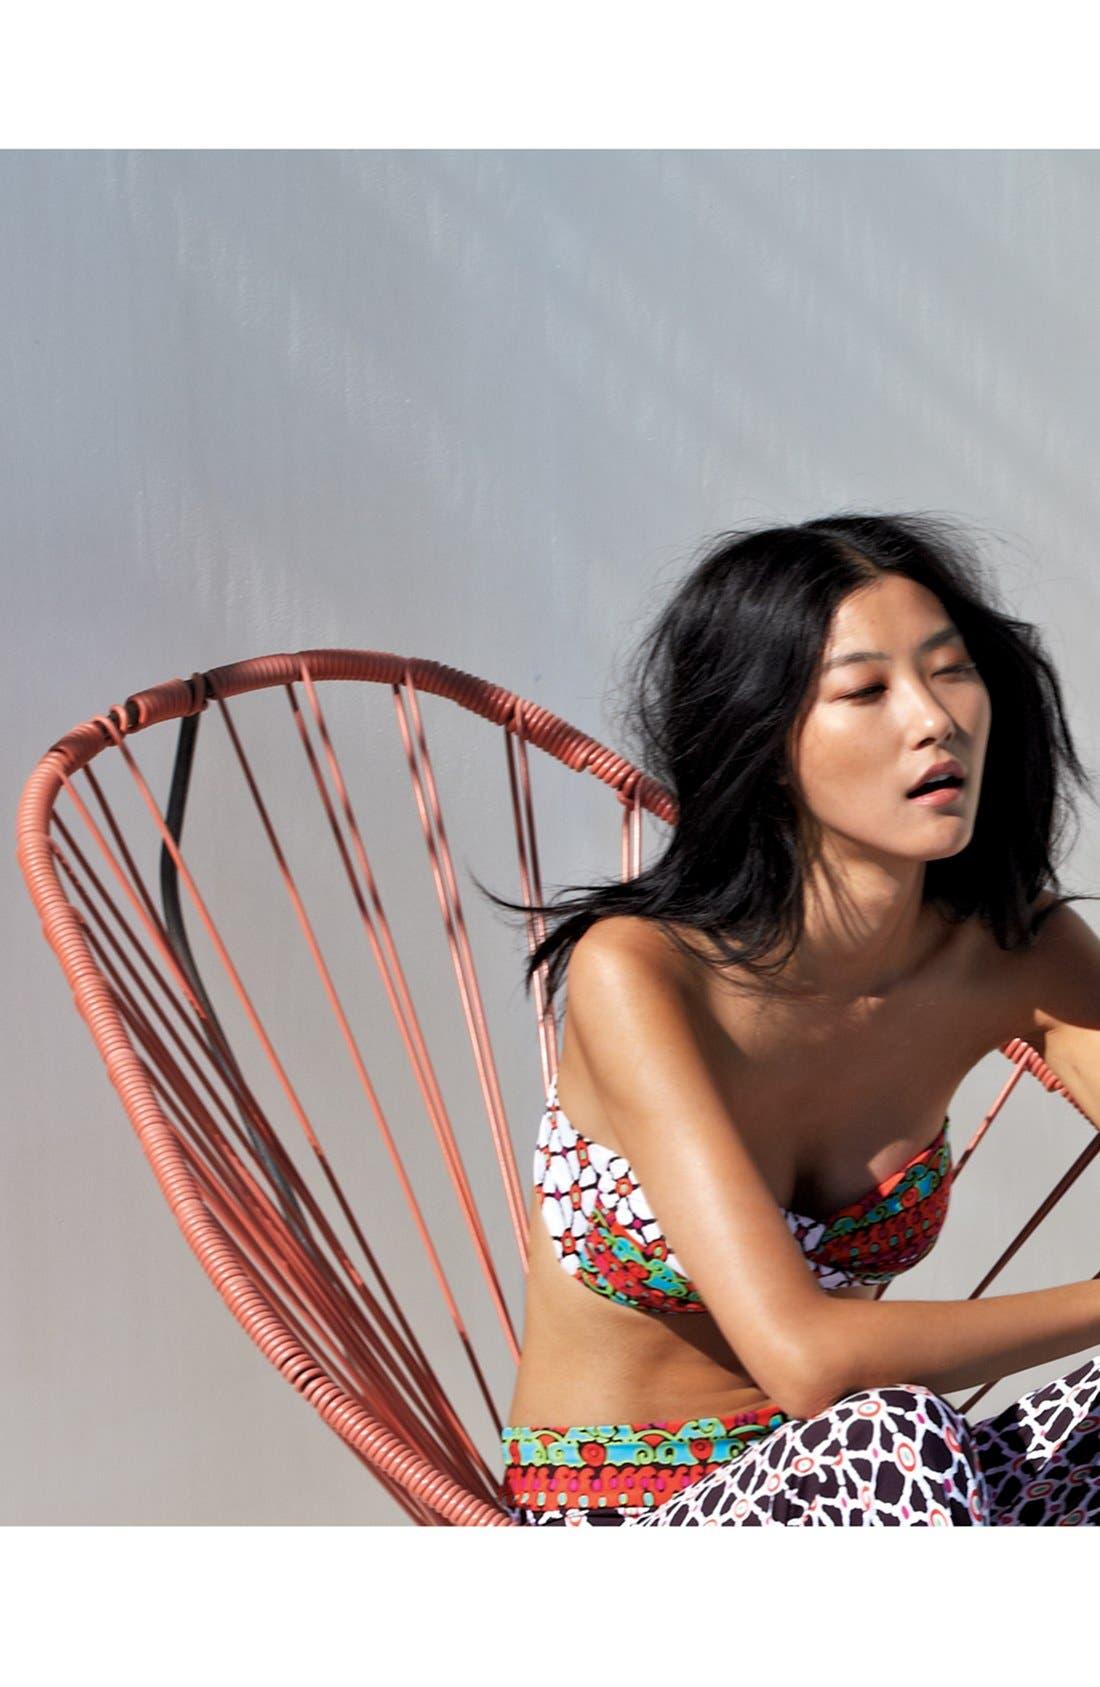 Alternate Image 1 Selected - Trina Turk Bikini Top & Bottoms